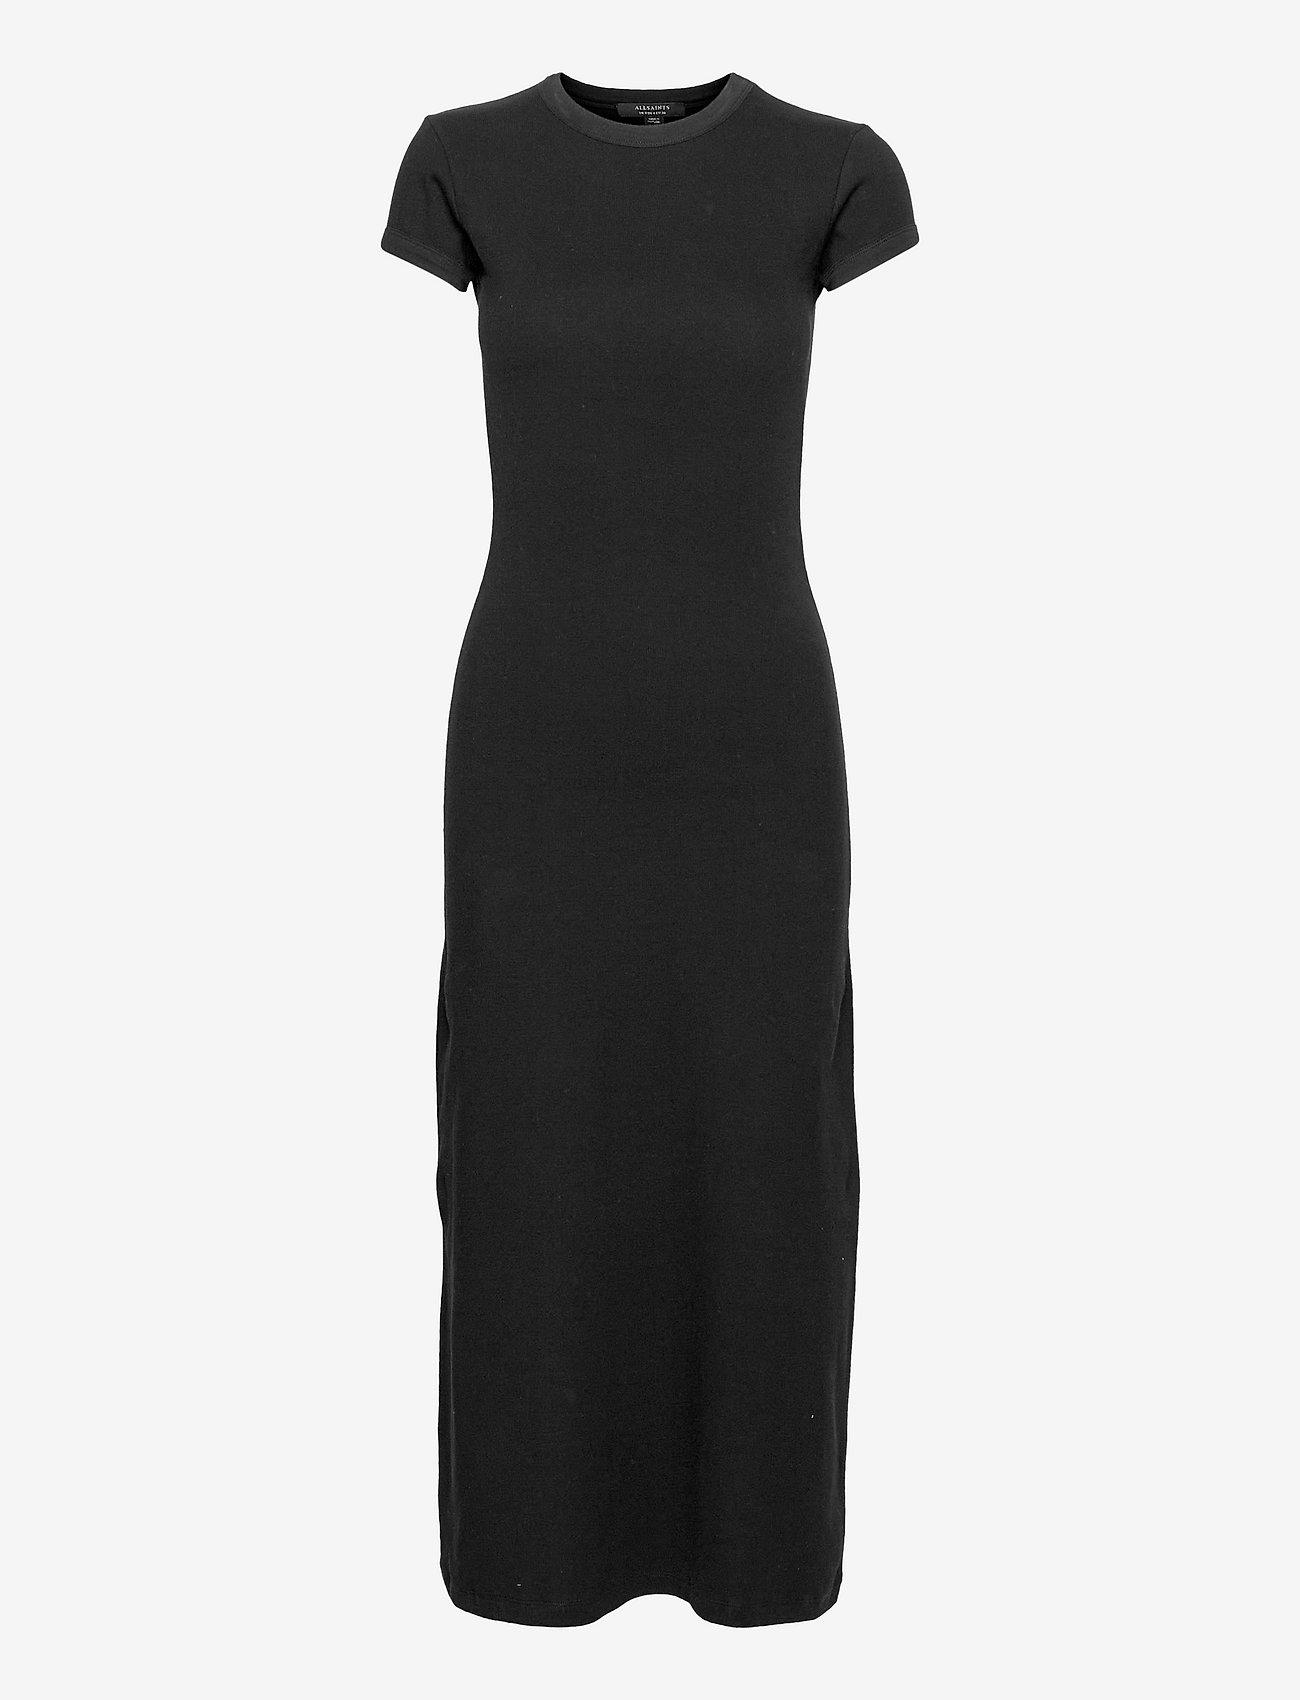 AllSaints - FRANKIE DRESS - maxi dresses - black - 0